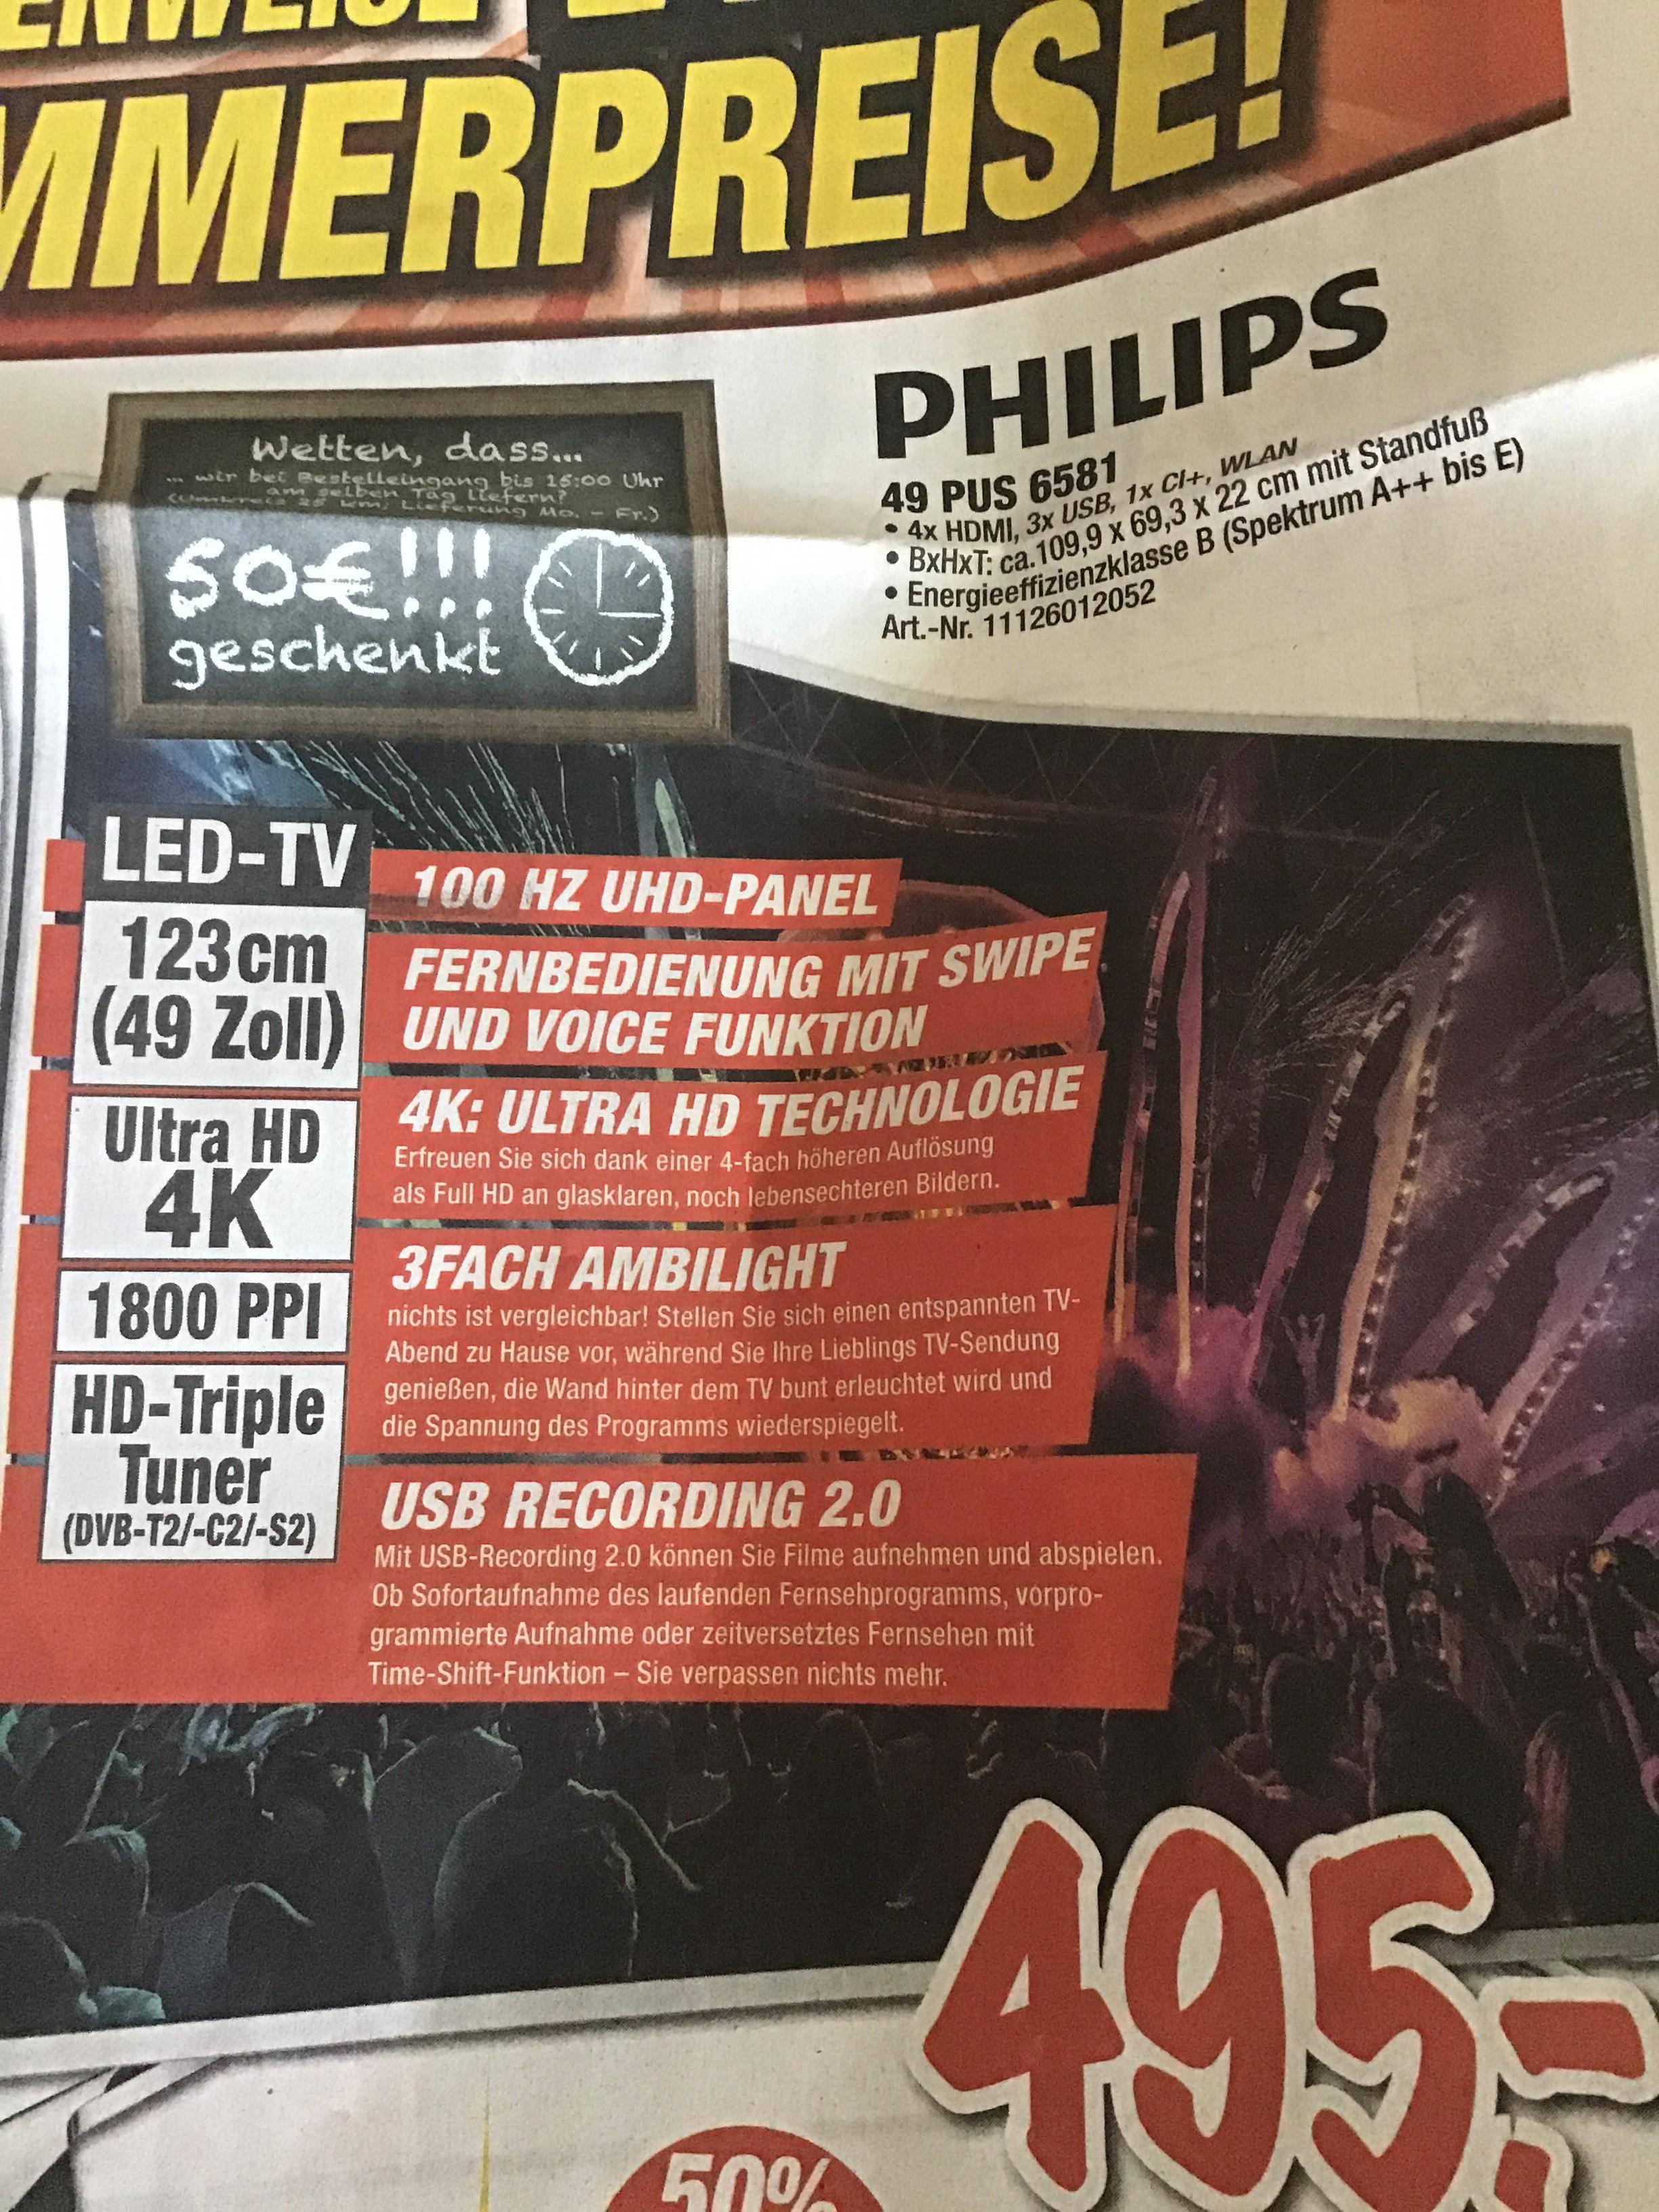 Philips 49 PUS 6581 expert (Lokal Stgt. Plochingen/Deizisau)